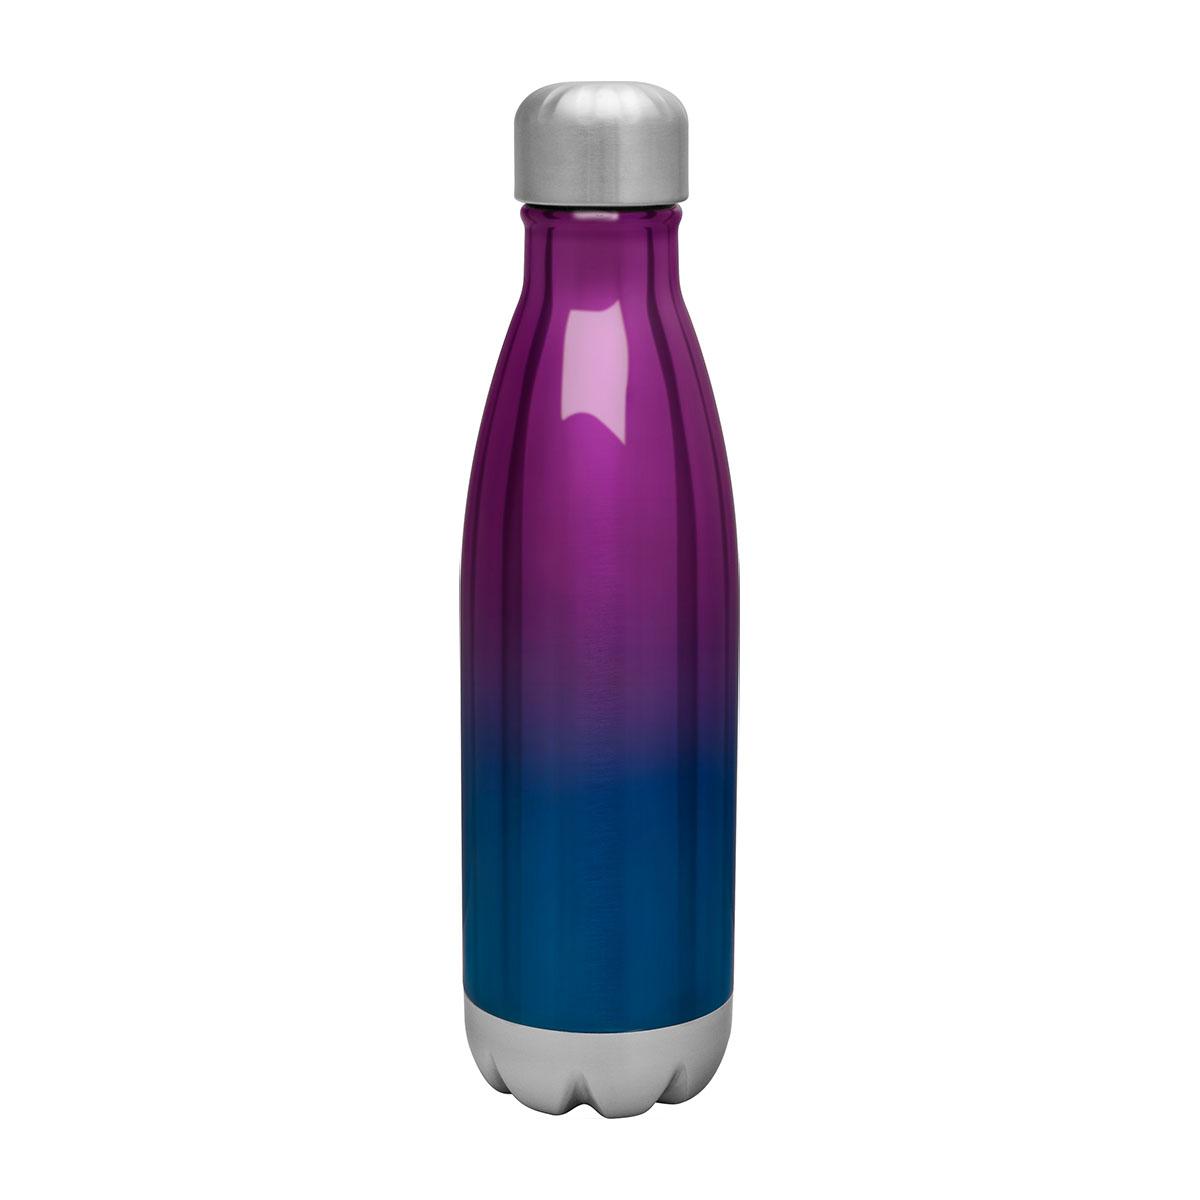 Dusk ombre bottle